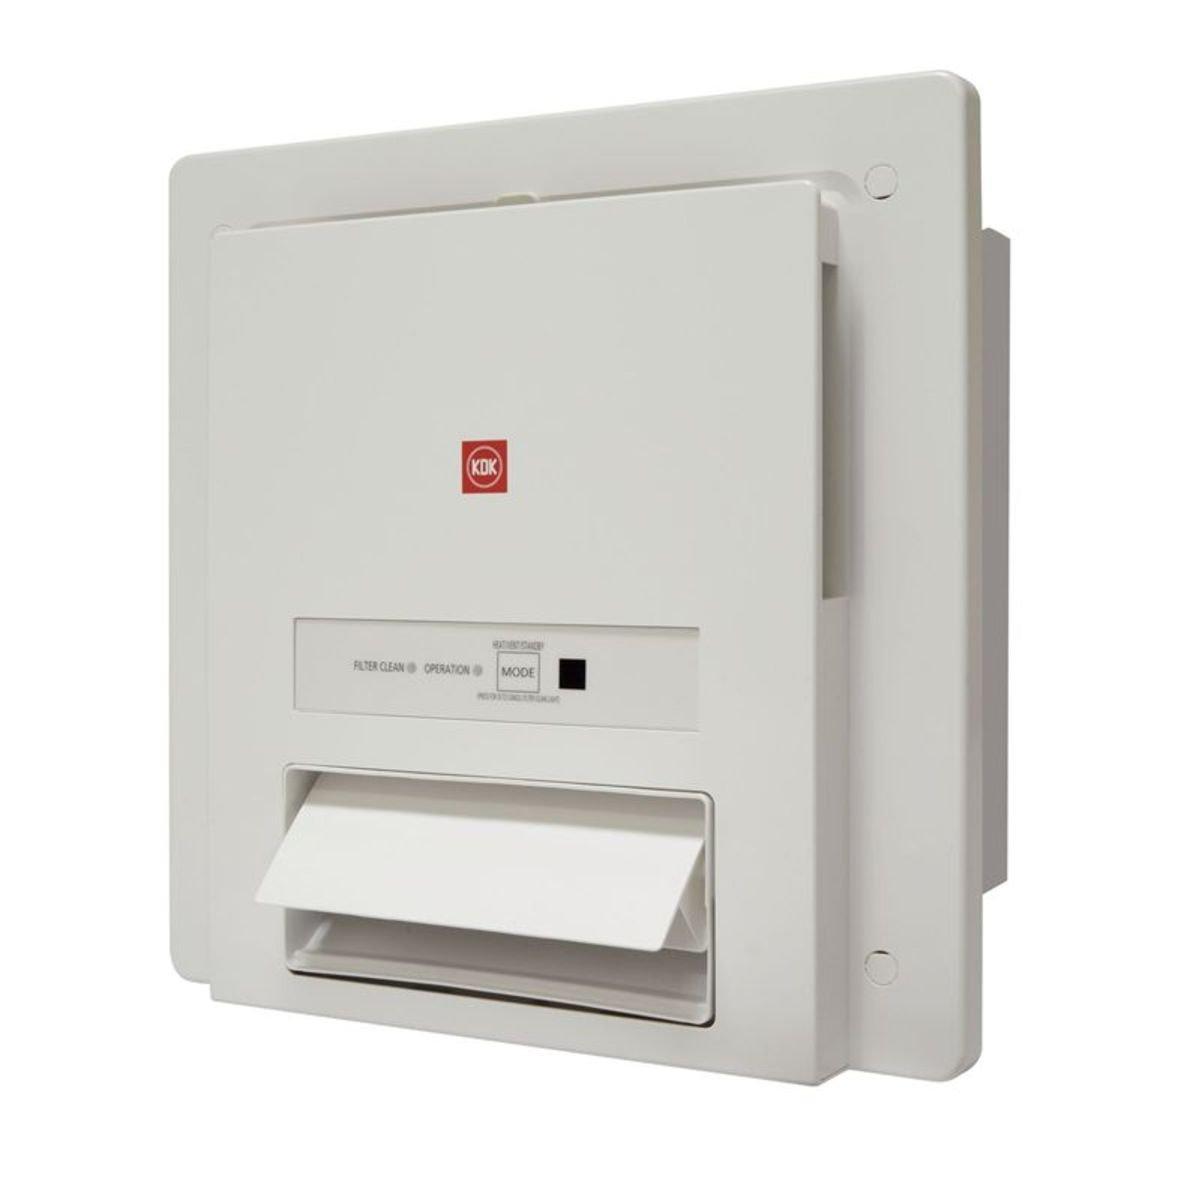 30BWAH/W PTC 無線遙控浴室寶 (窗口式)(不包安裝)